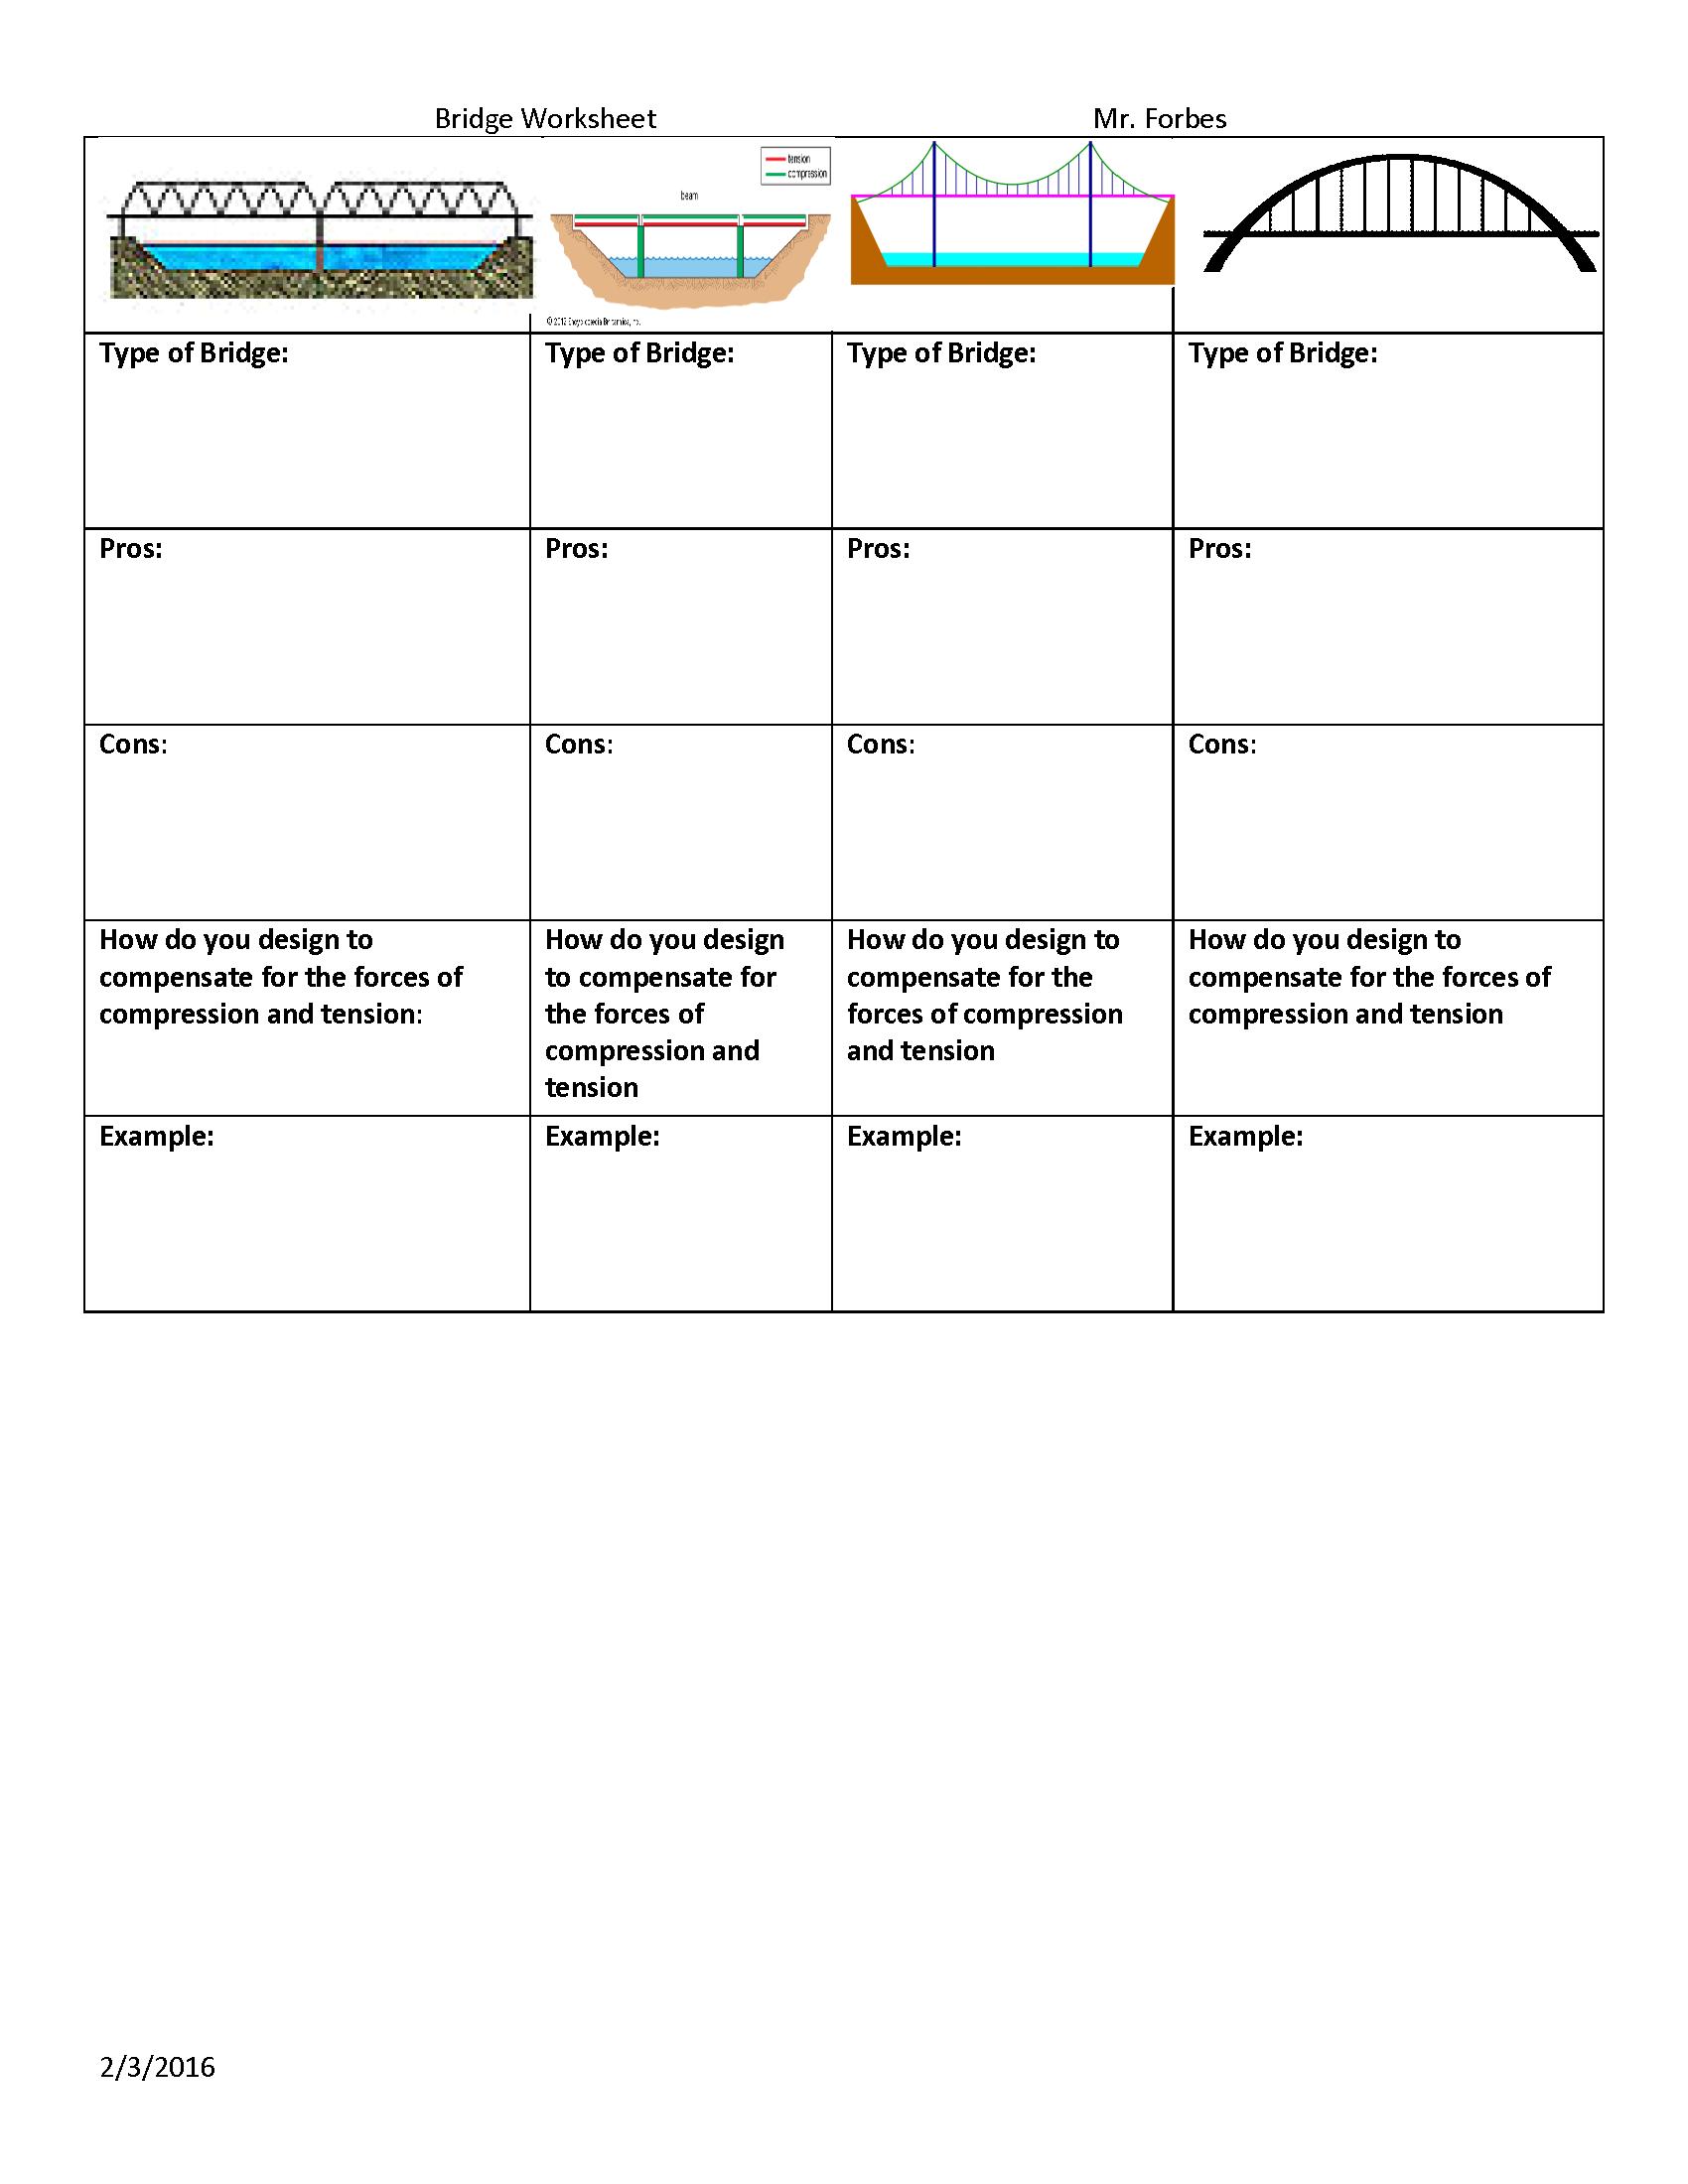 Worksheet to use the Bridge Project Grades 6 to 8   Stem teacher [ 2200 x 1700 Pixel ]